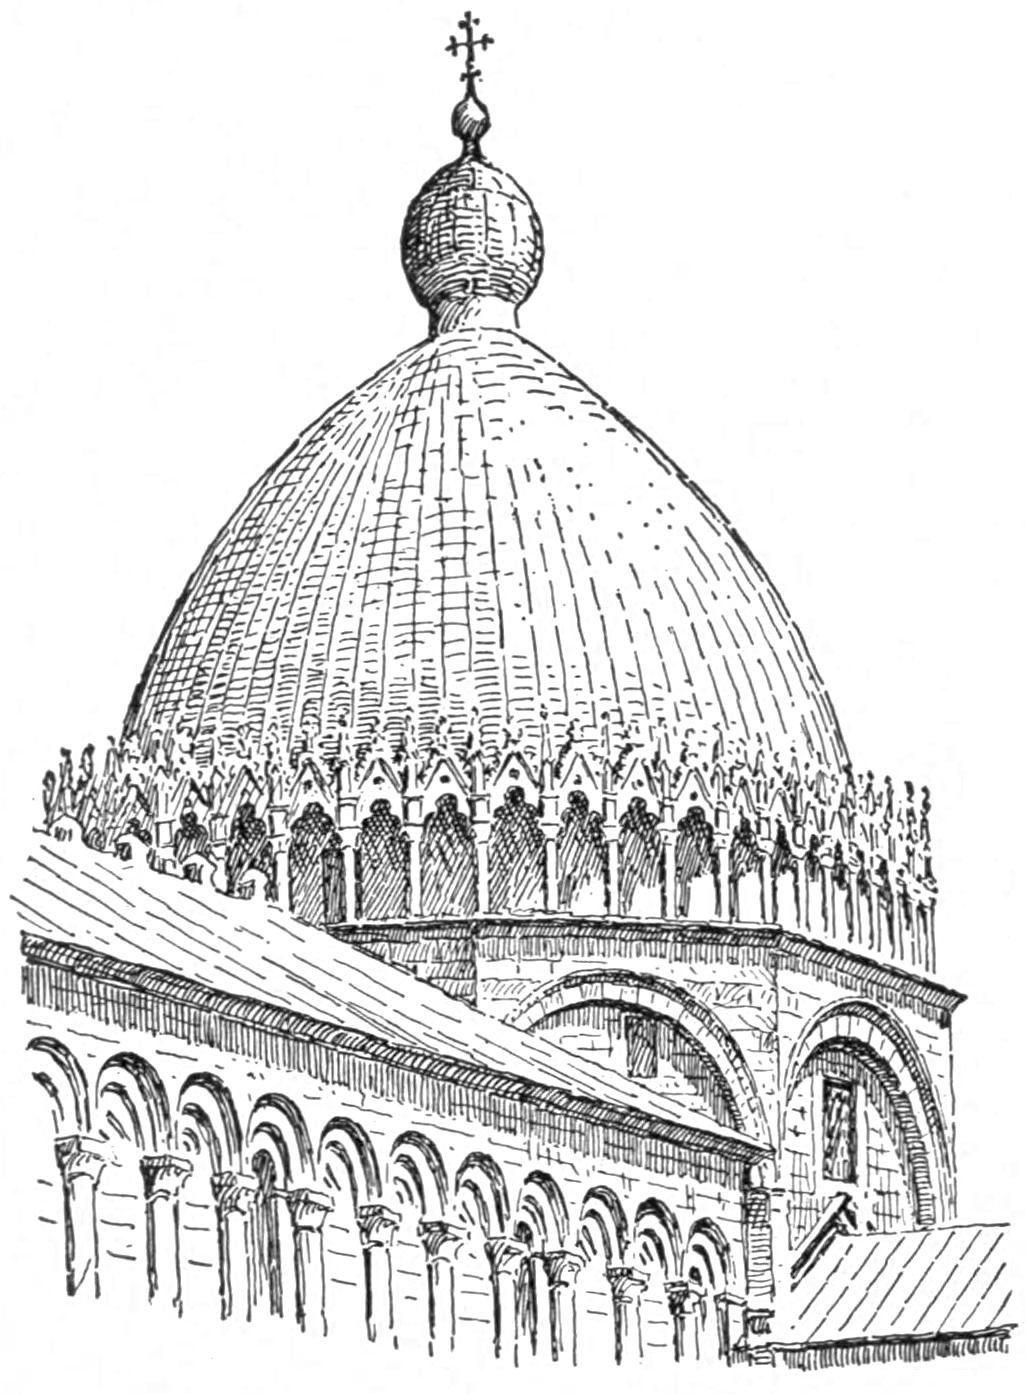 File:Dome of Pisa (Character of Renaissance Architecture).png - Renaissance PNG